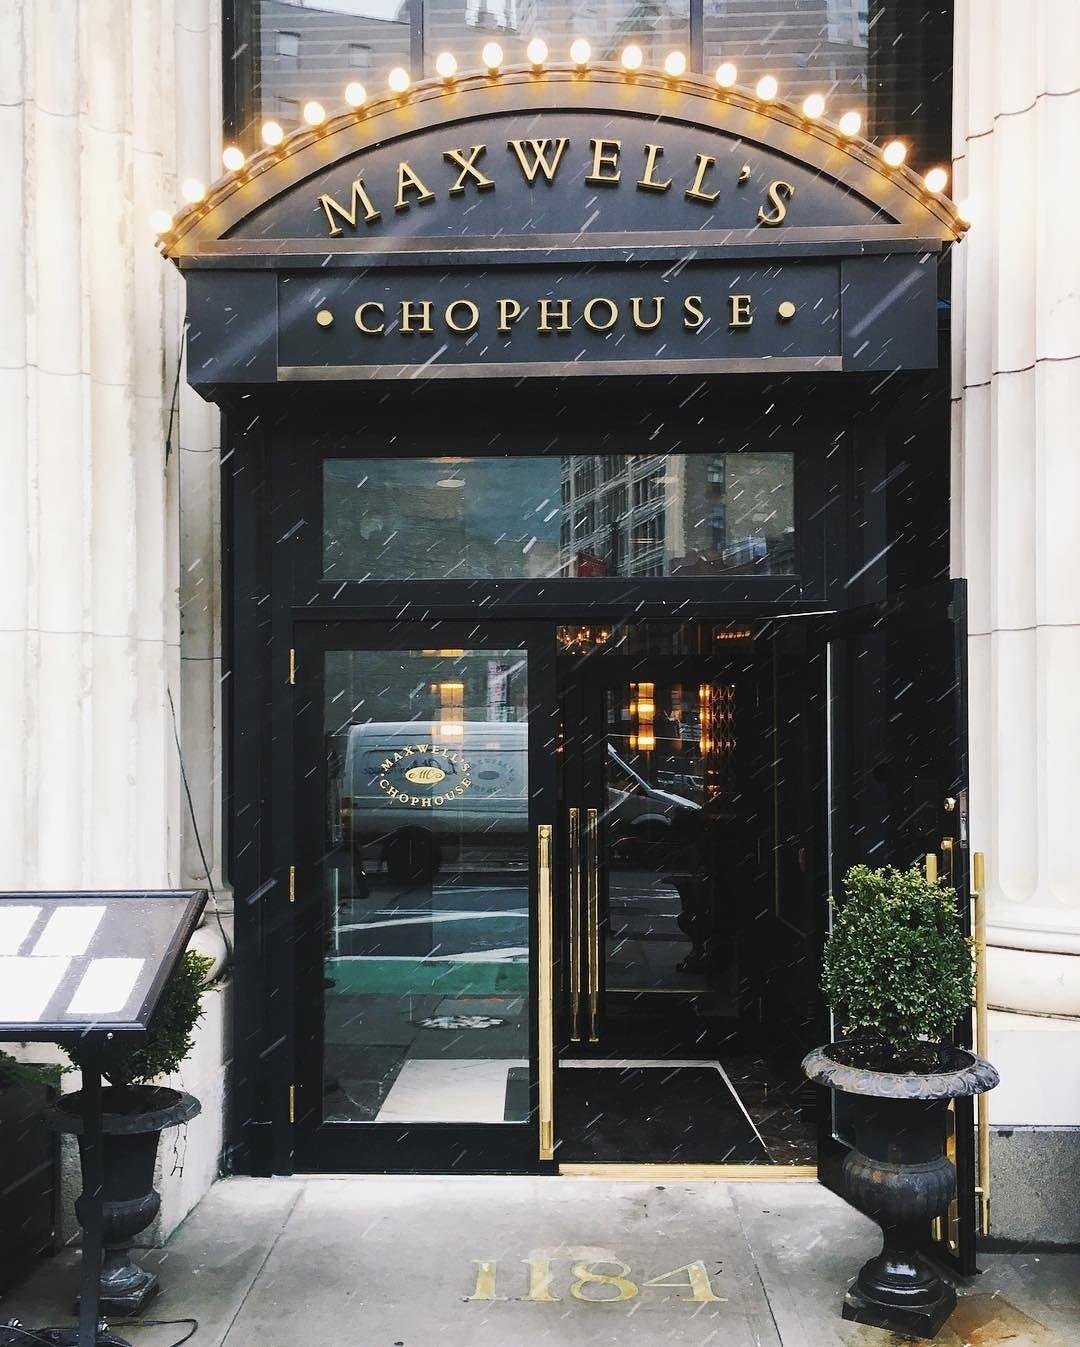 & Maxwell\u0027s Chophouse \u2013 a MICHELIN Guide Restaurant in New York City